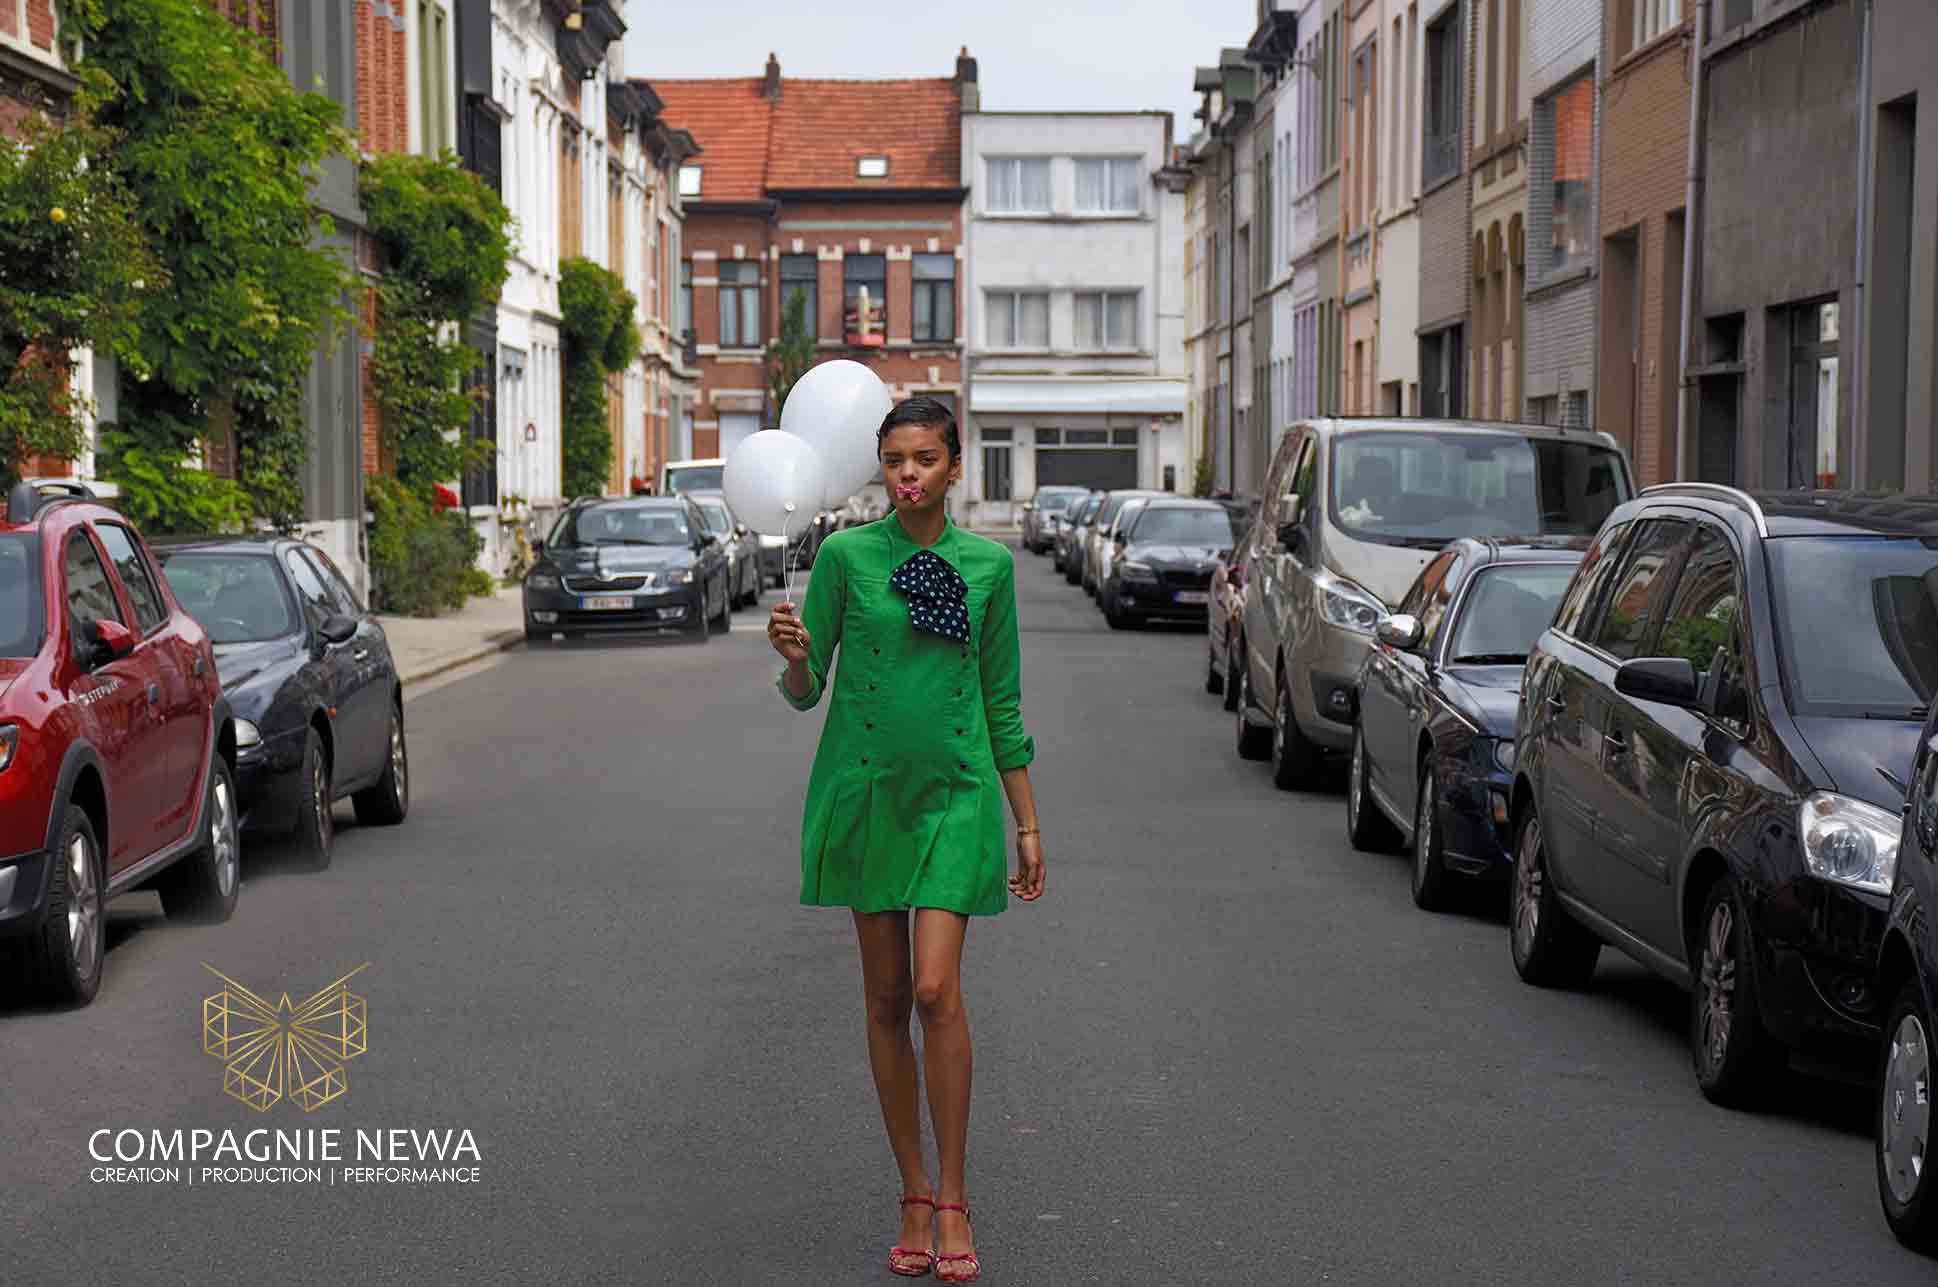 Compagnie_NEWA_models_antwerpen_people_entertainment